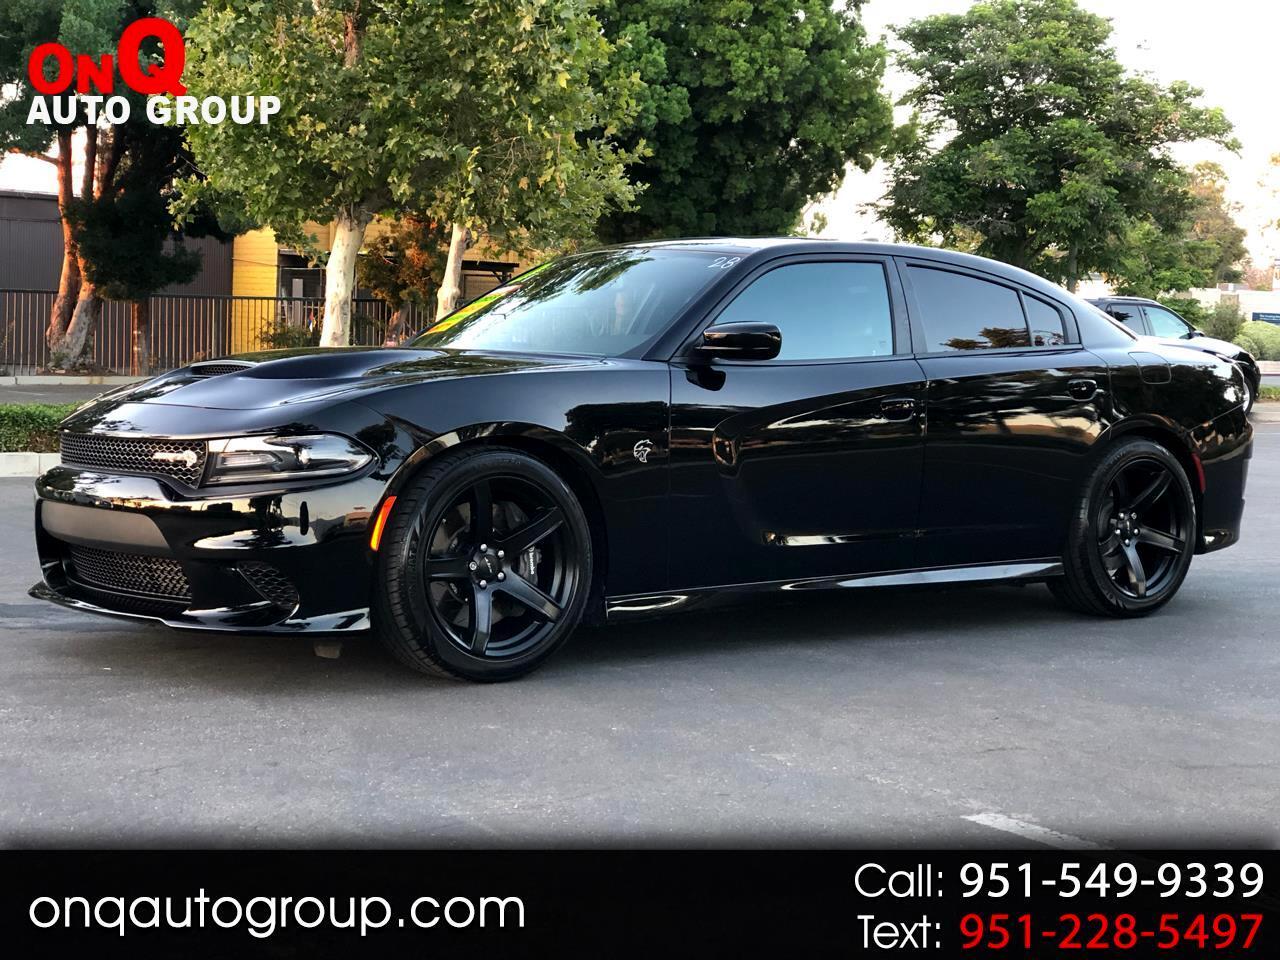 2018 Dodge Charger SRT Hellcat RWD